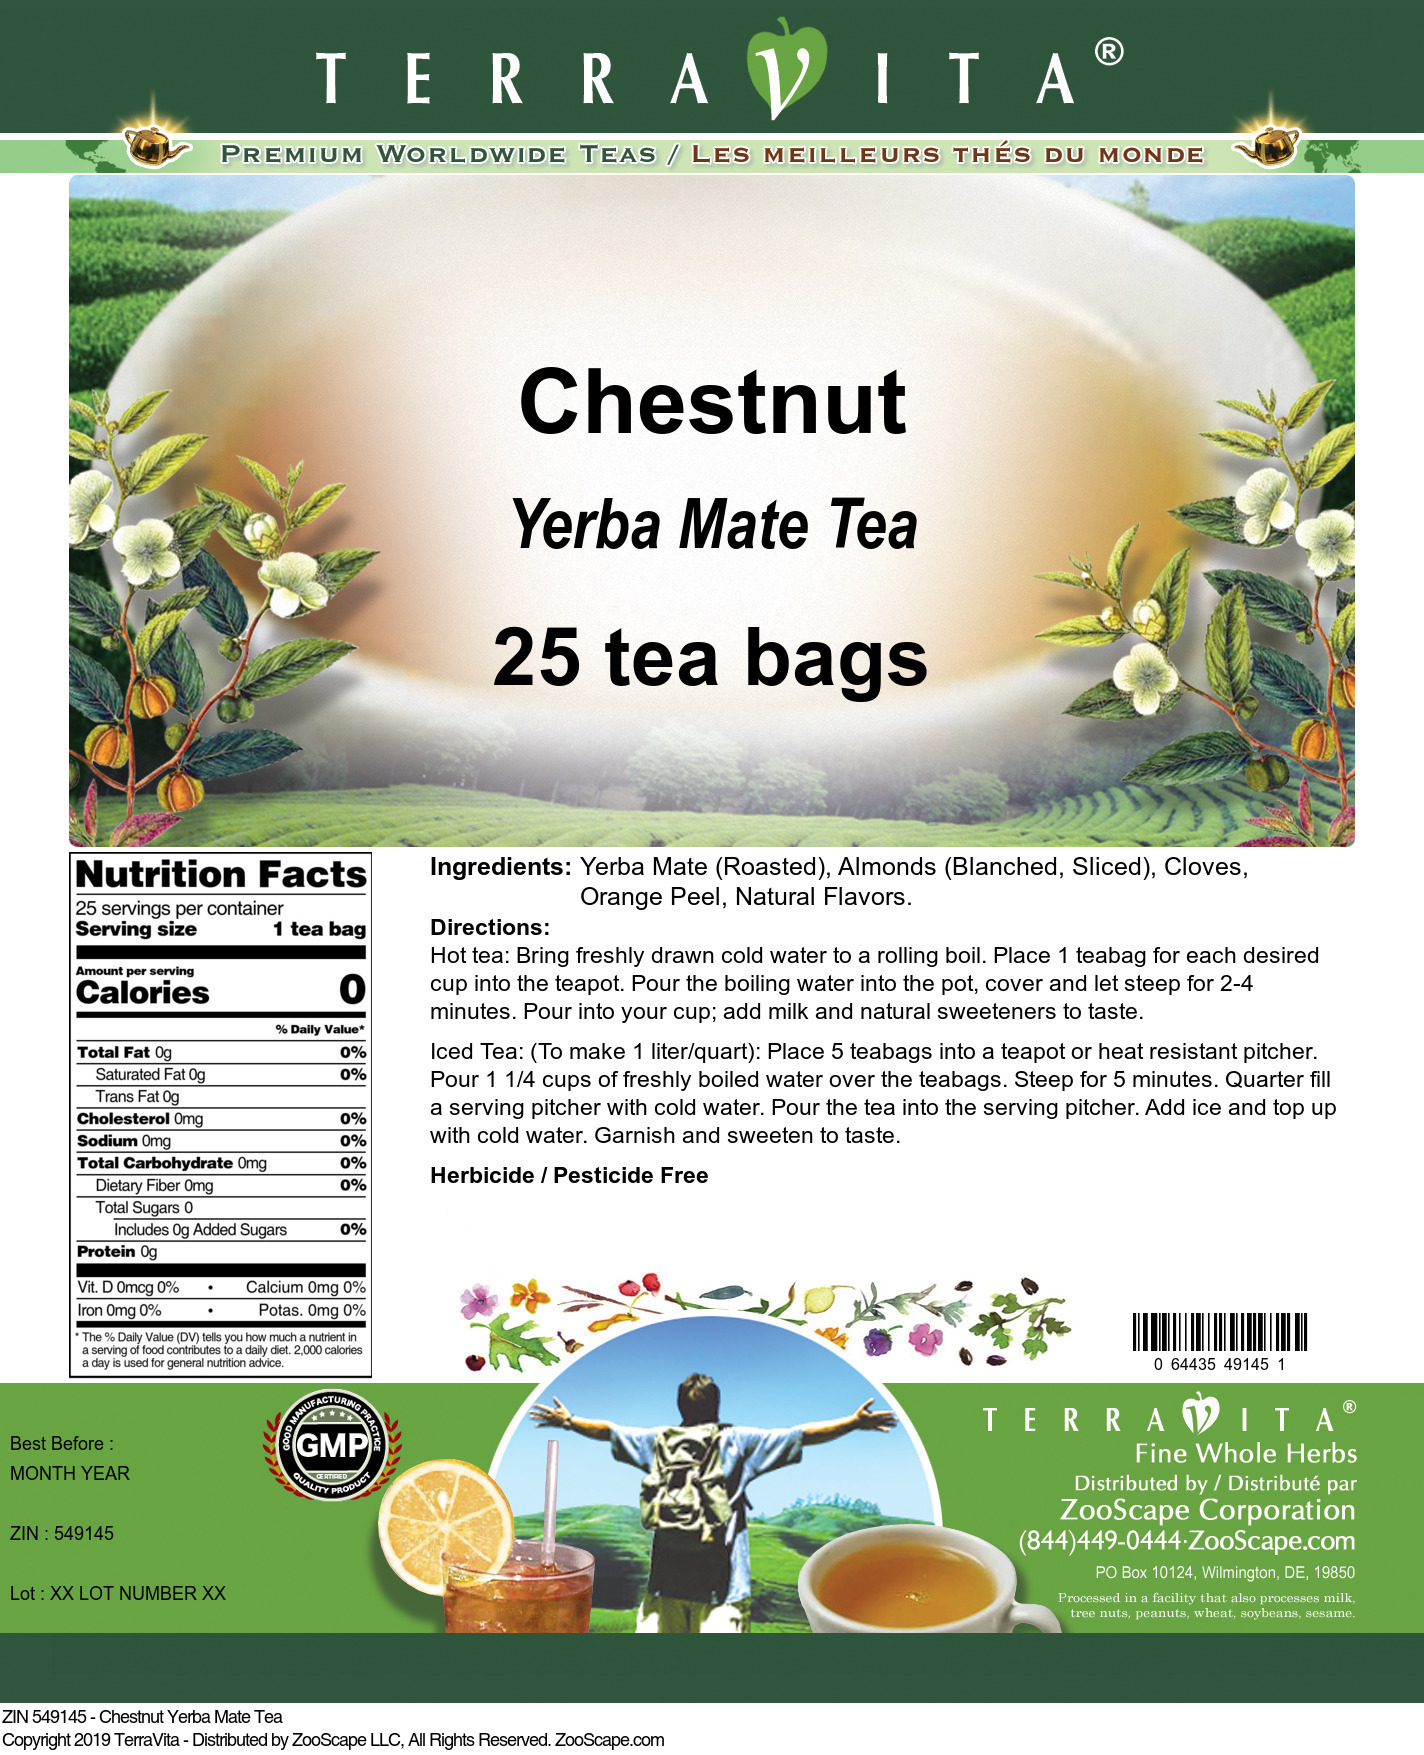 Chestnut Yerba Mate Tea